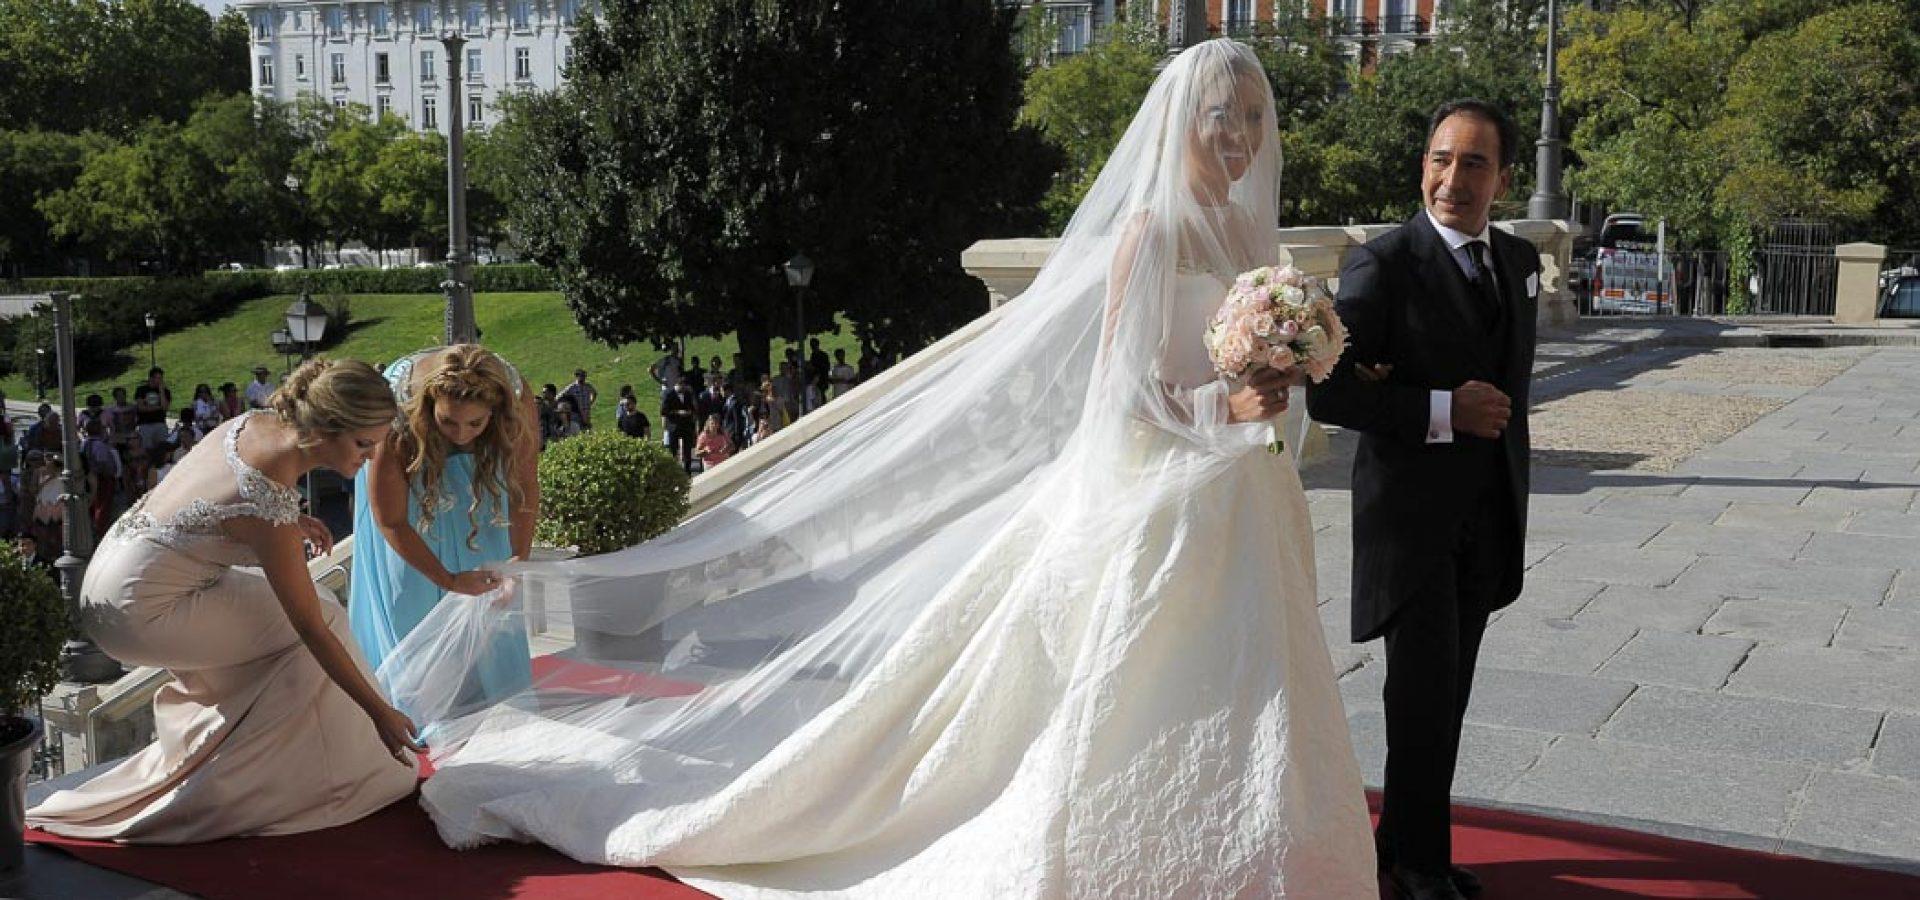 Ricardo Coral - fotógrafo de boda